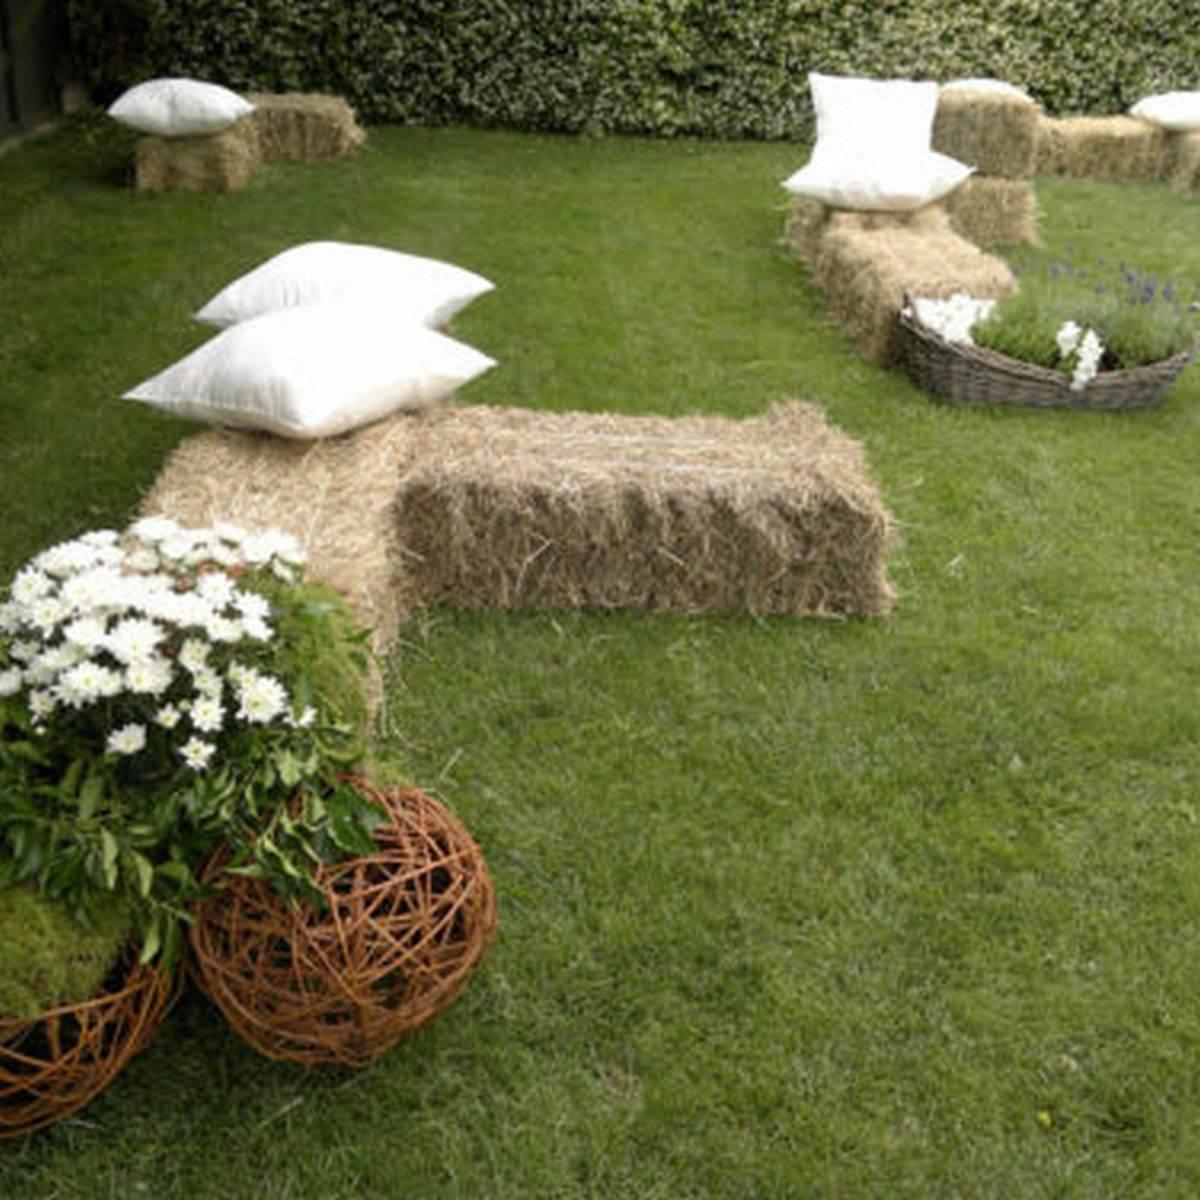 Matrimonio Country Chic Maison Mariage Wedding Planner : Wedding planner padova venezia treviso vicenza maison mariage